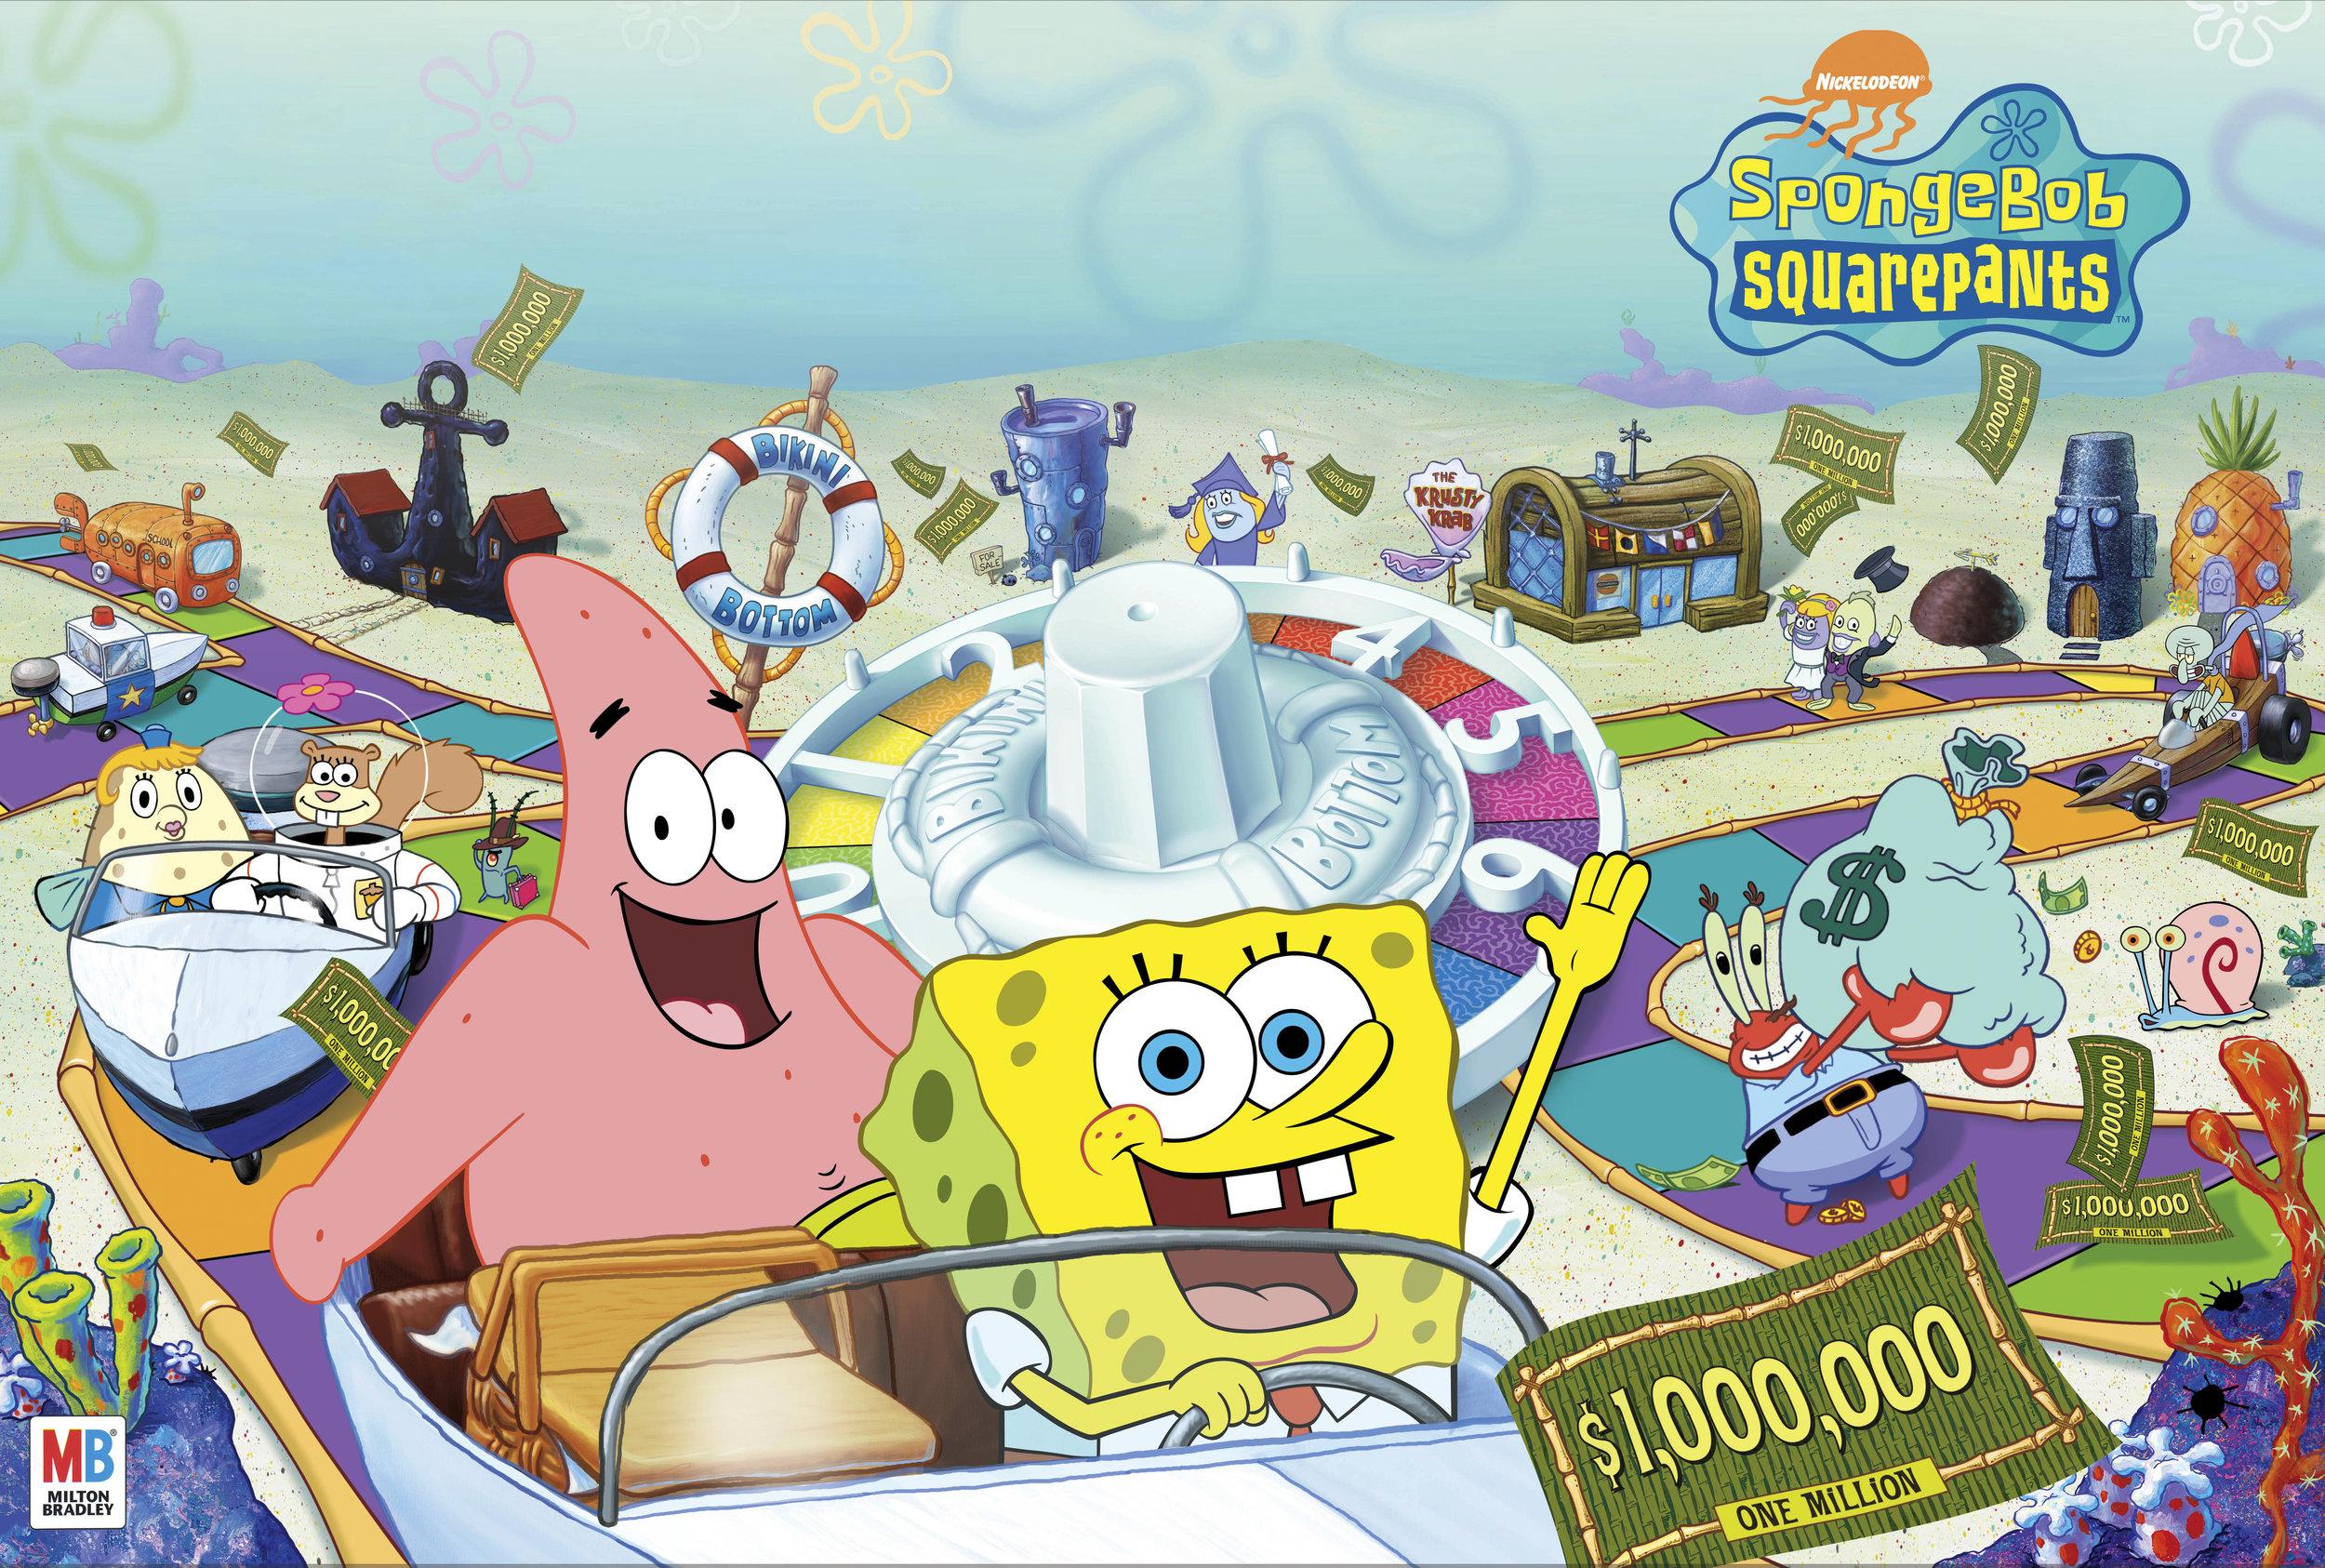 SpongeBob Squarepants Game of Life Package